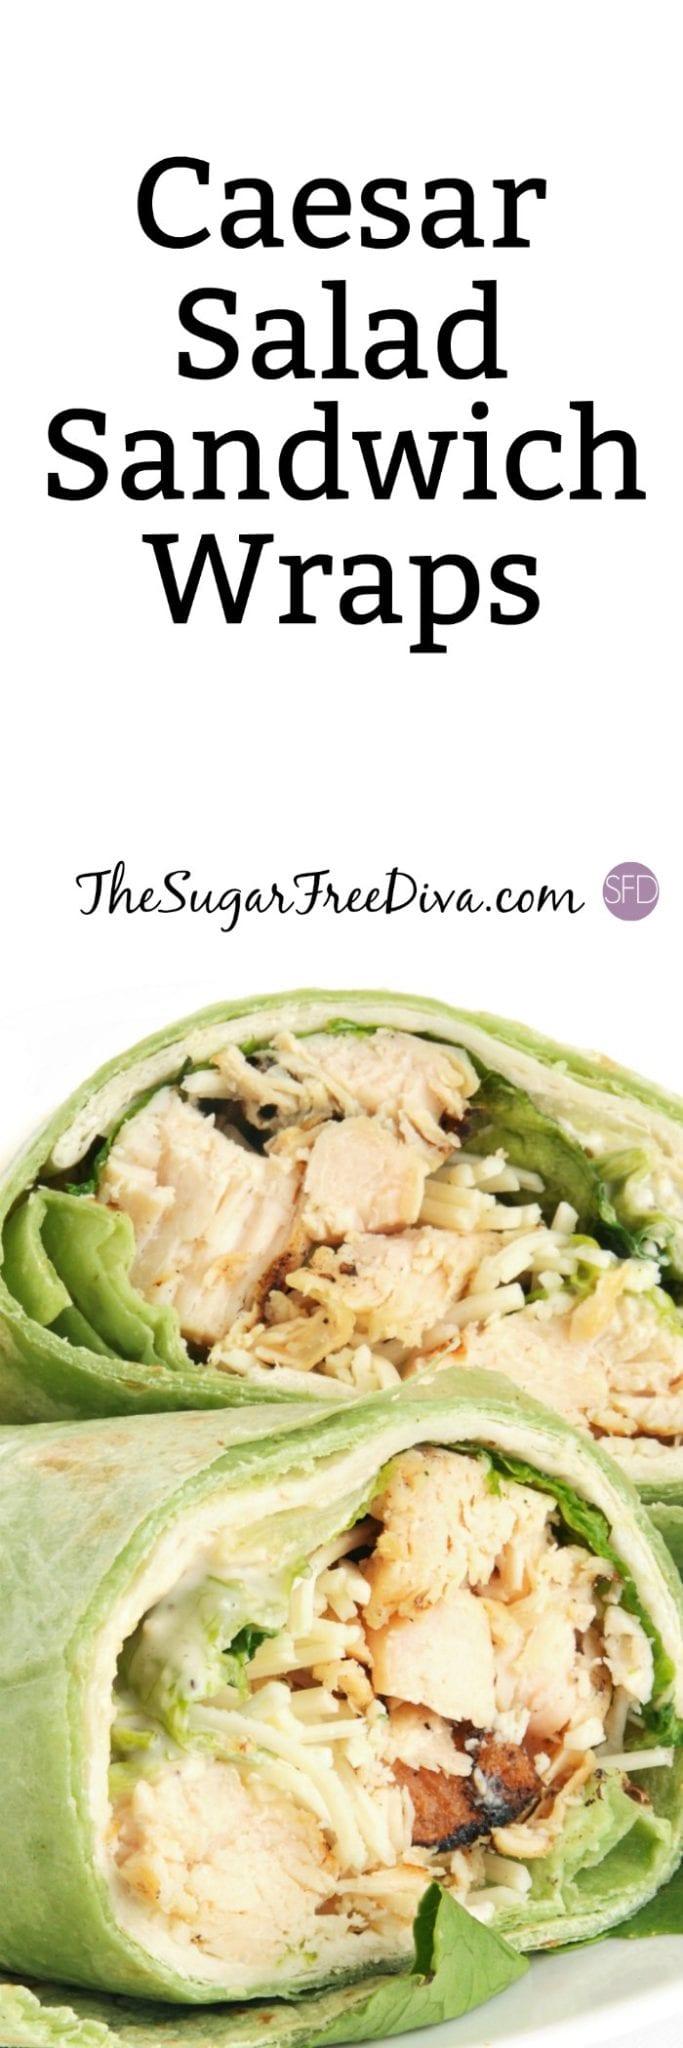 Caesar Salad Sandwich Wraps